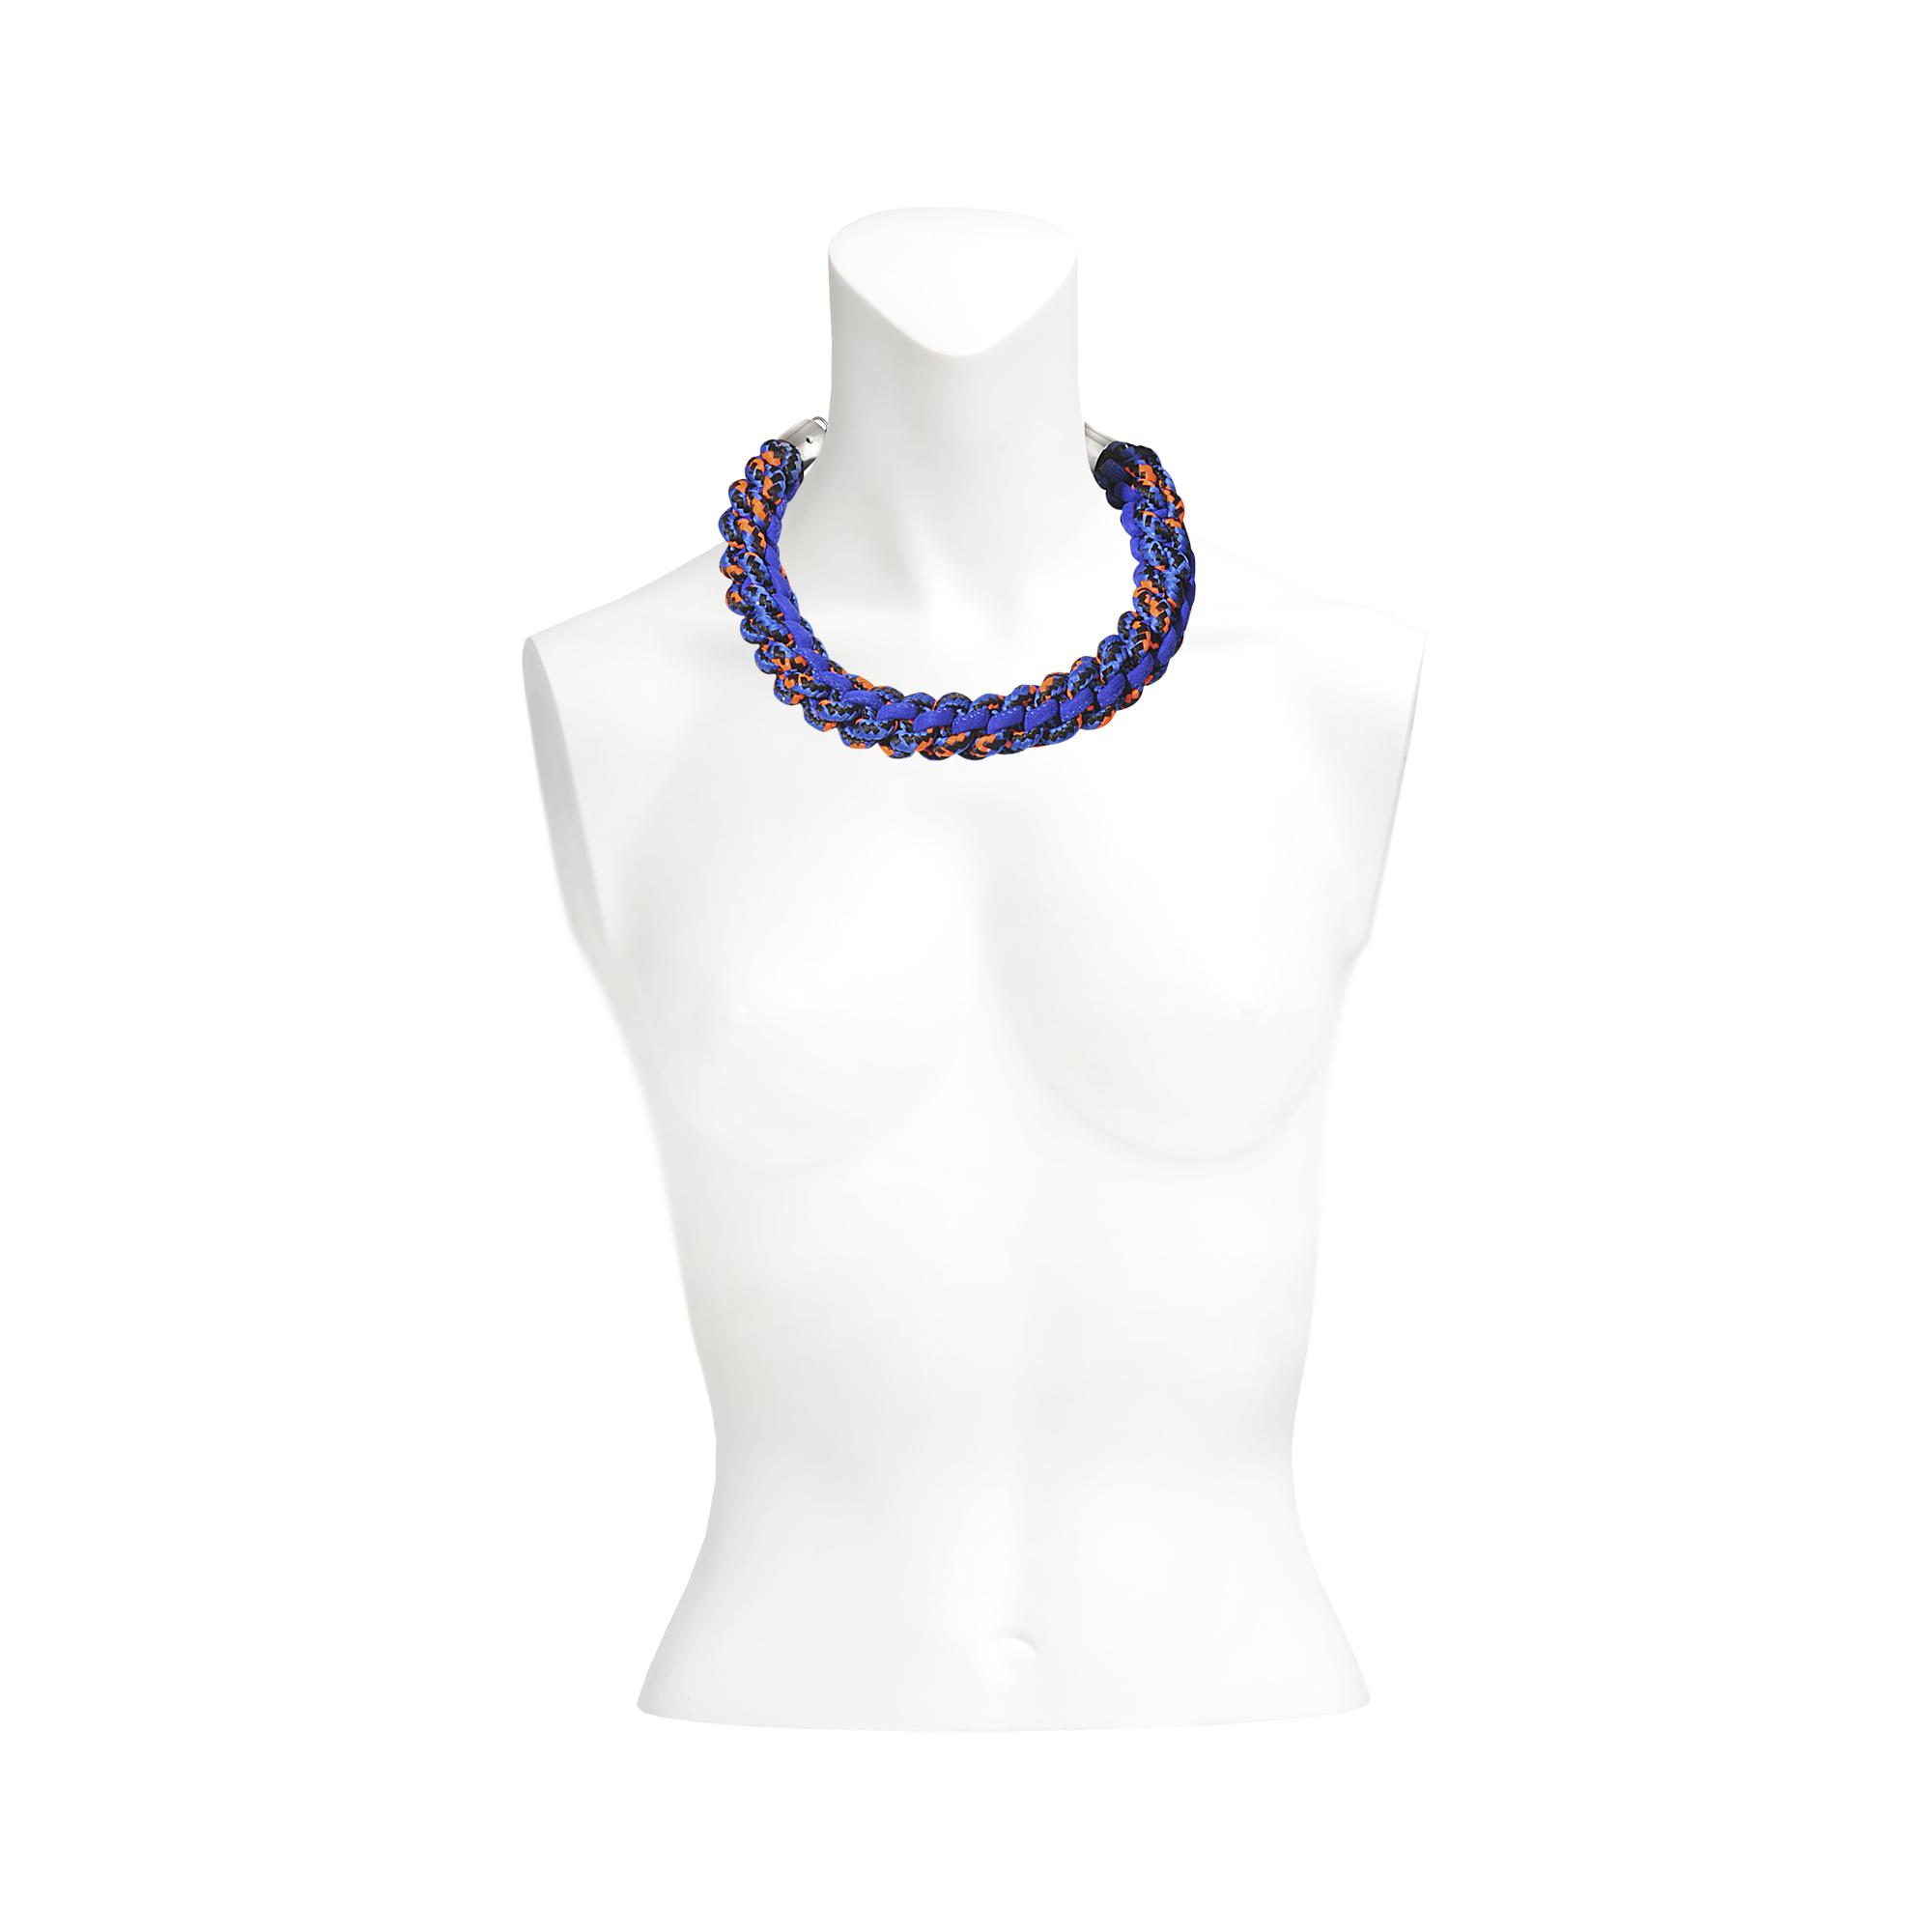 DSquared² Sparkle Tech Necklace in Blue